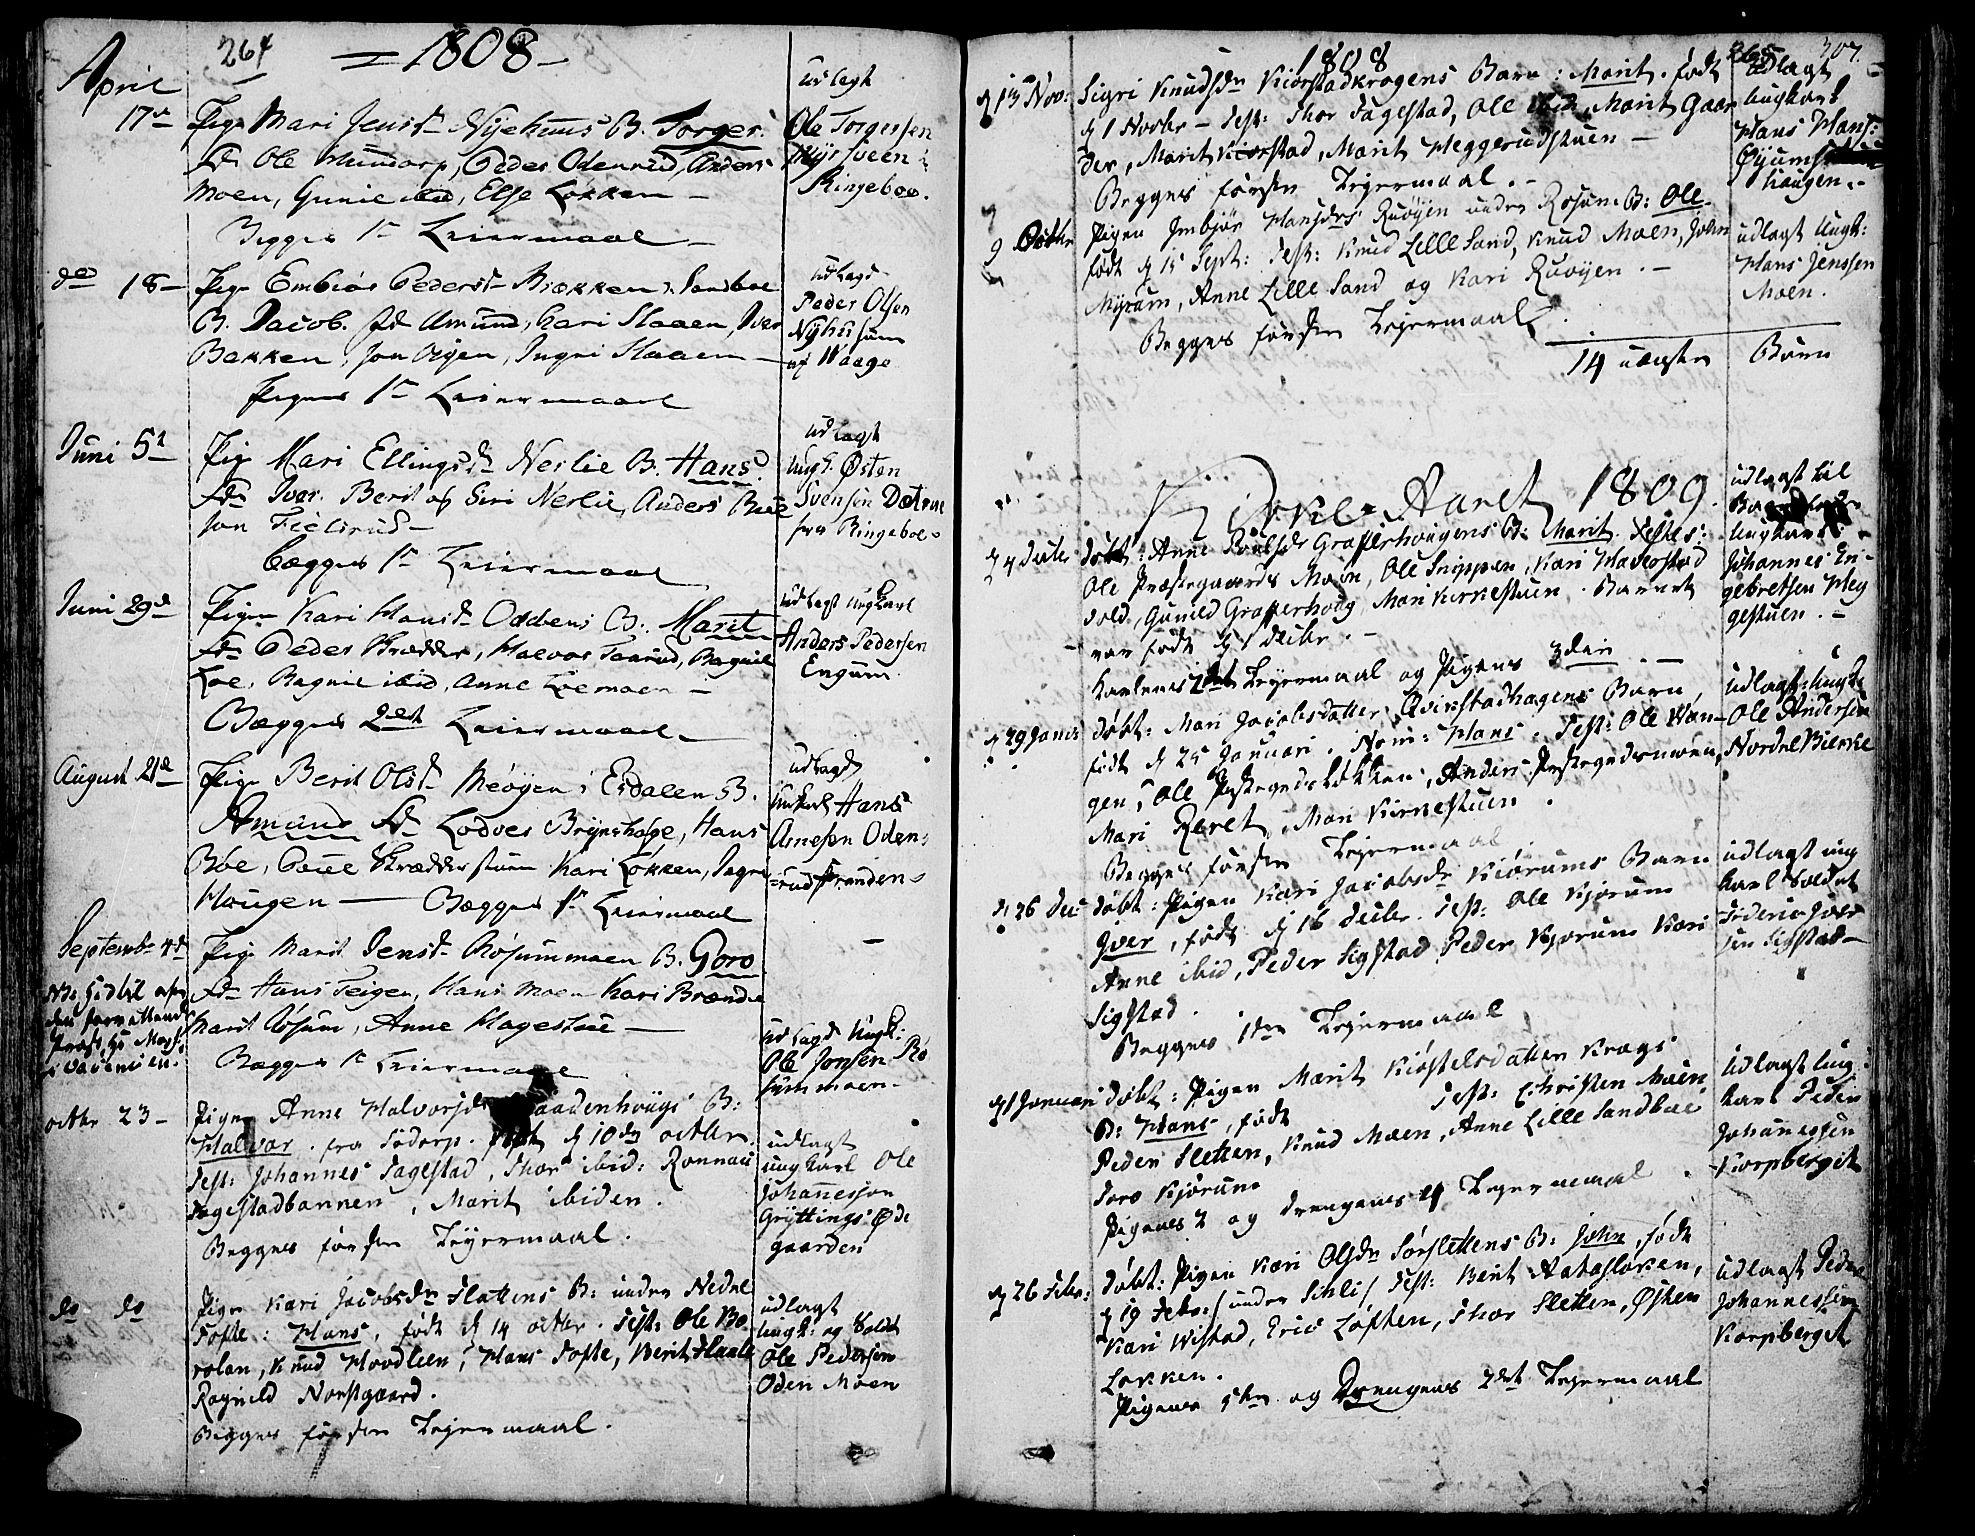 SAH, Fron prestekontor, H/Ha/Haa/L0001: Ministerialbok nr. 1, 1799-1816, s. 264-265